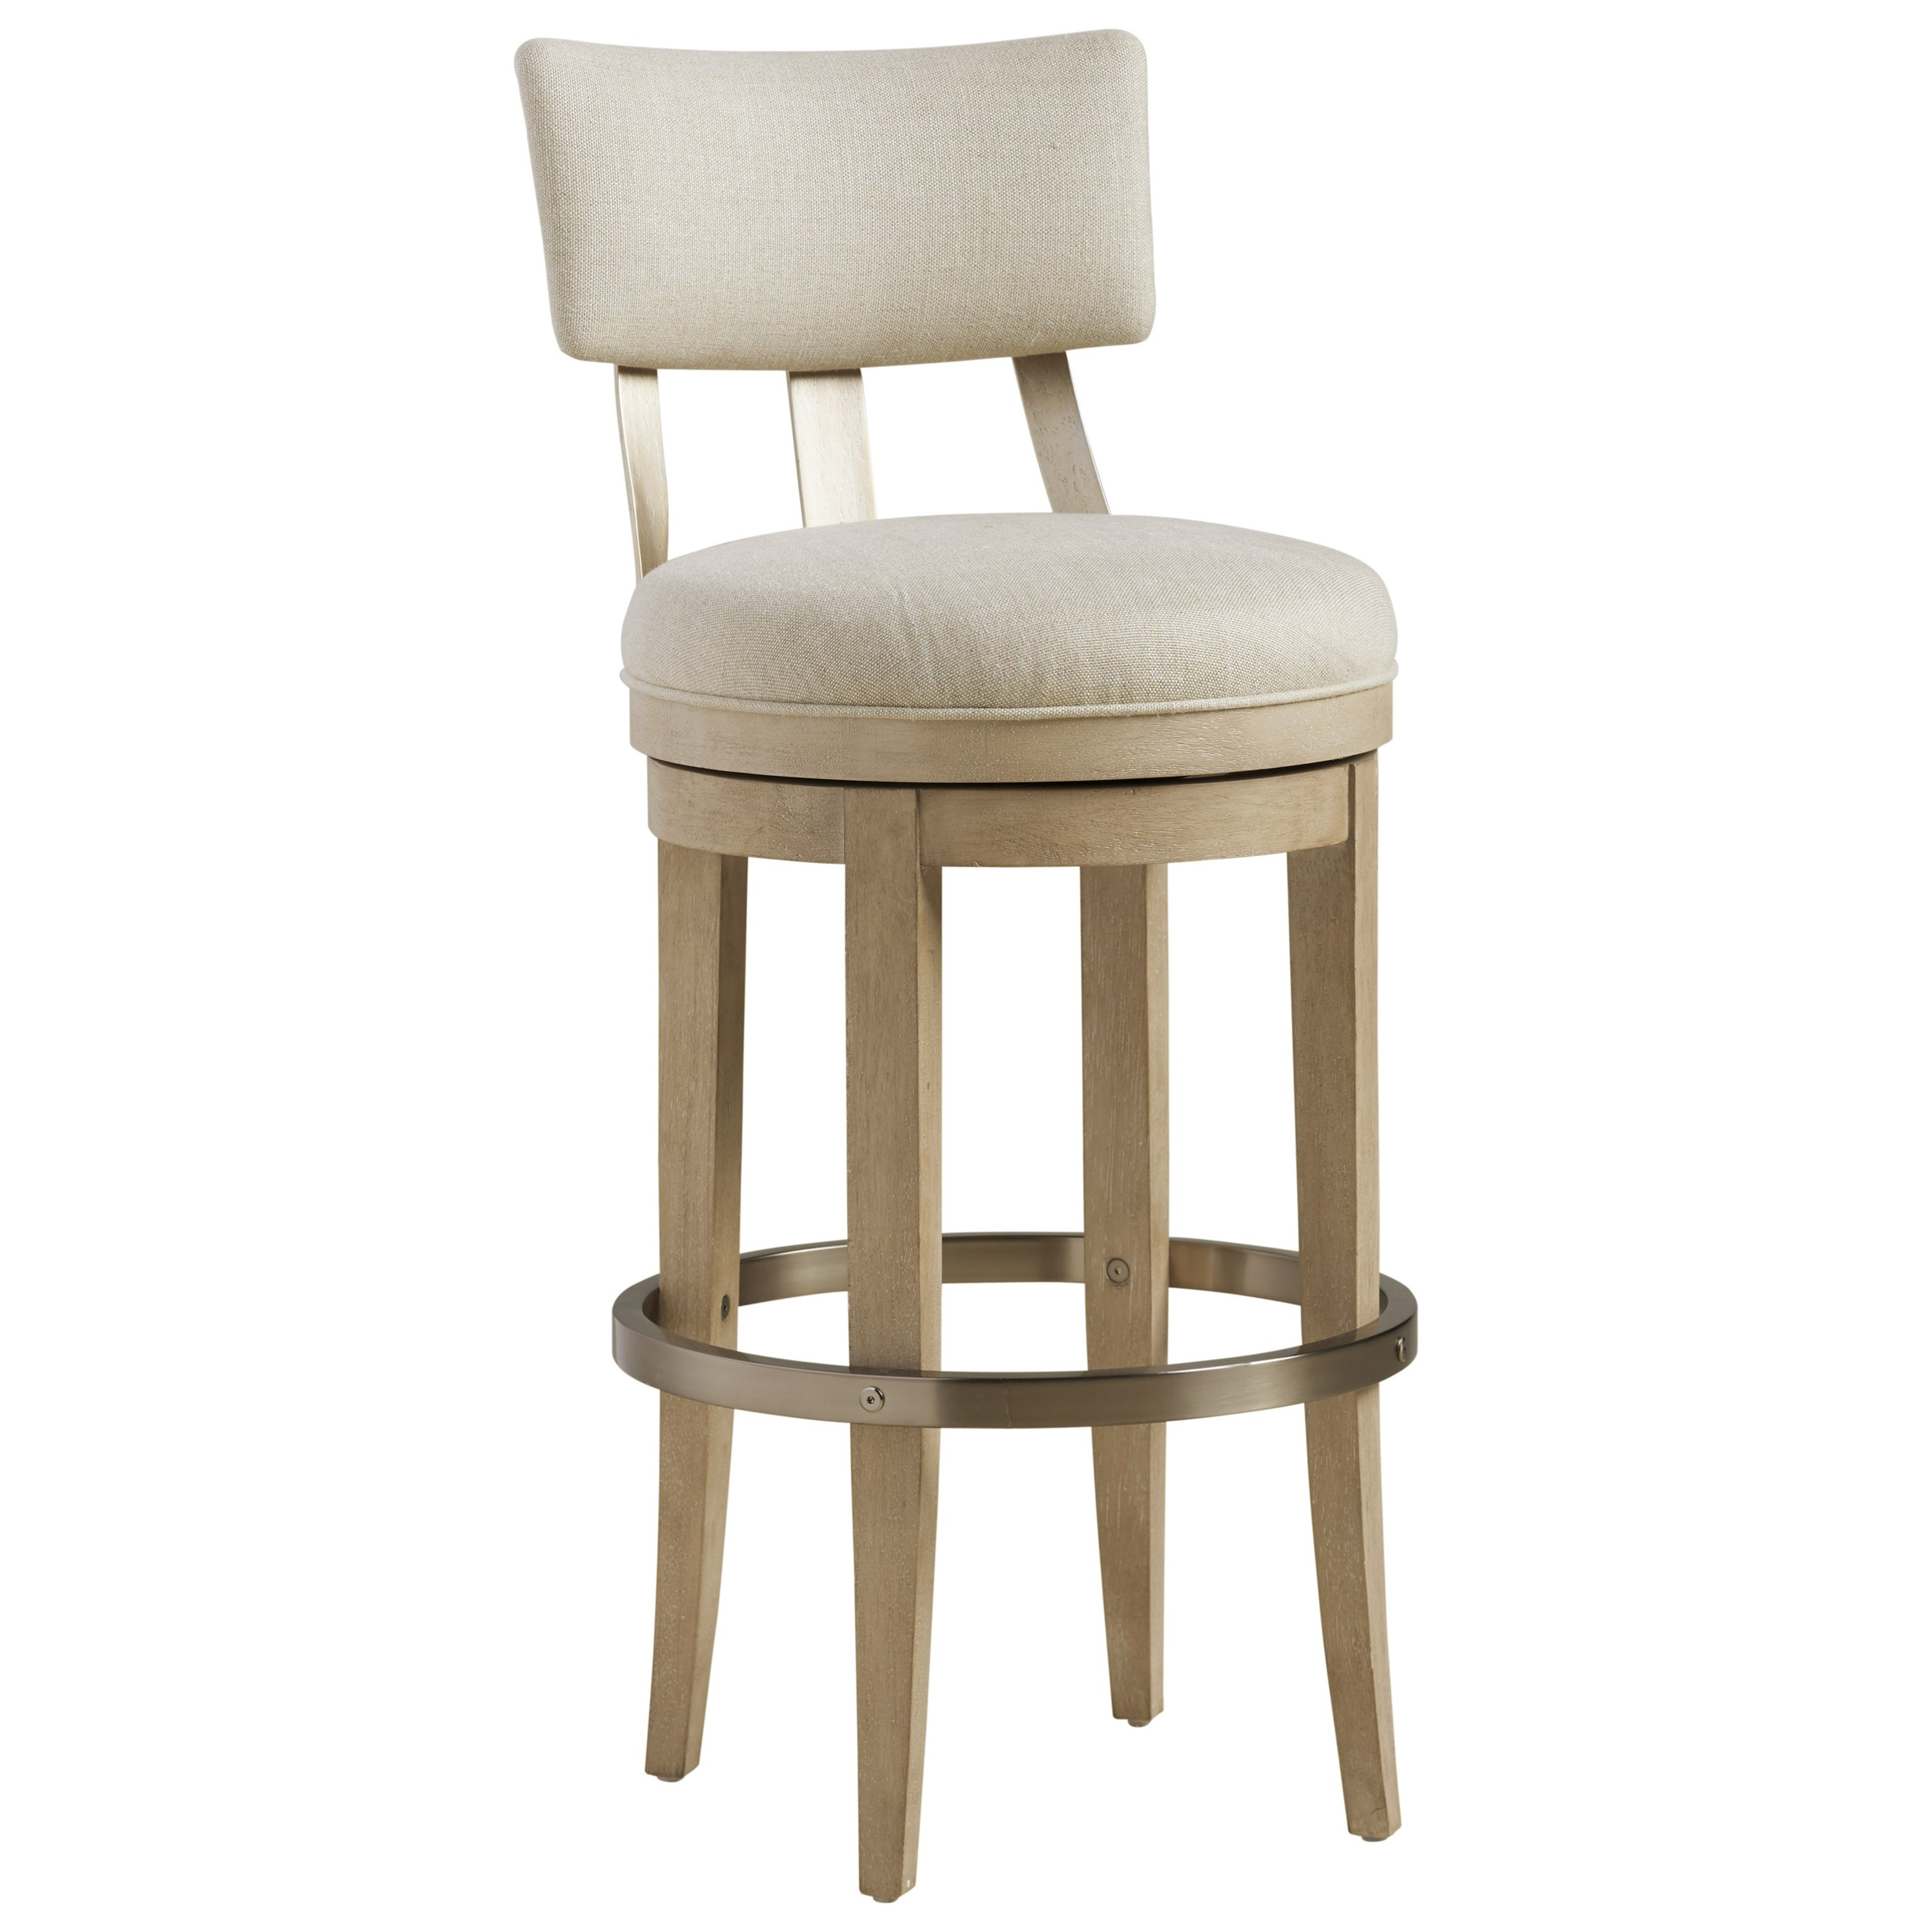 Malibu Cliffside Swivel Upholstered Bar Stool by Barclay Butera at Baer's Furniture